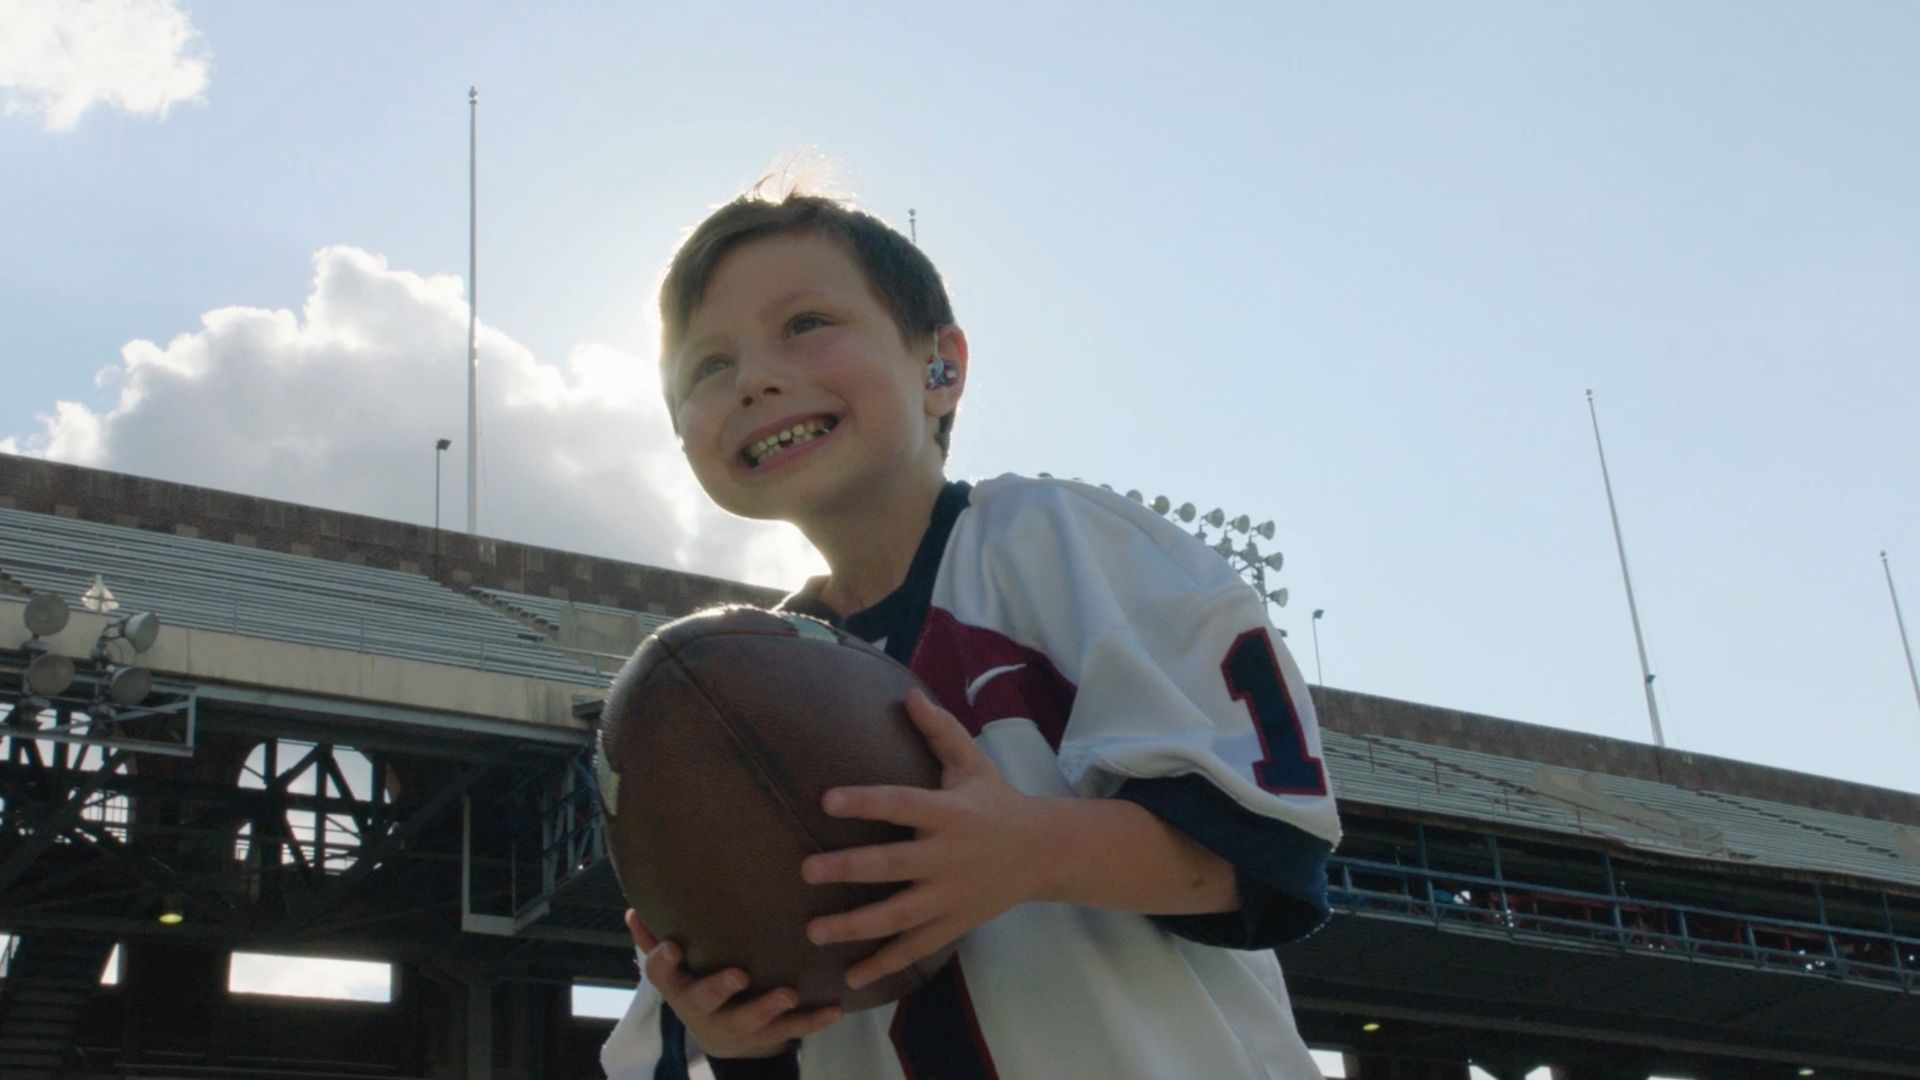 Foudy's Finds: Six-year-old cancer survivor inspires as Penn football's captain